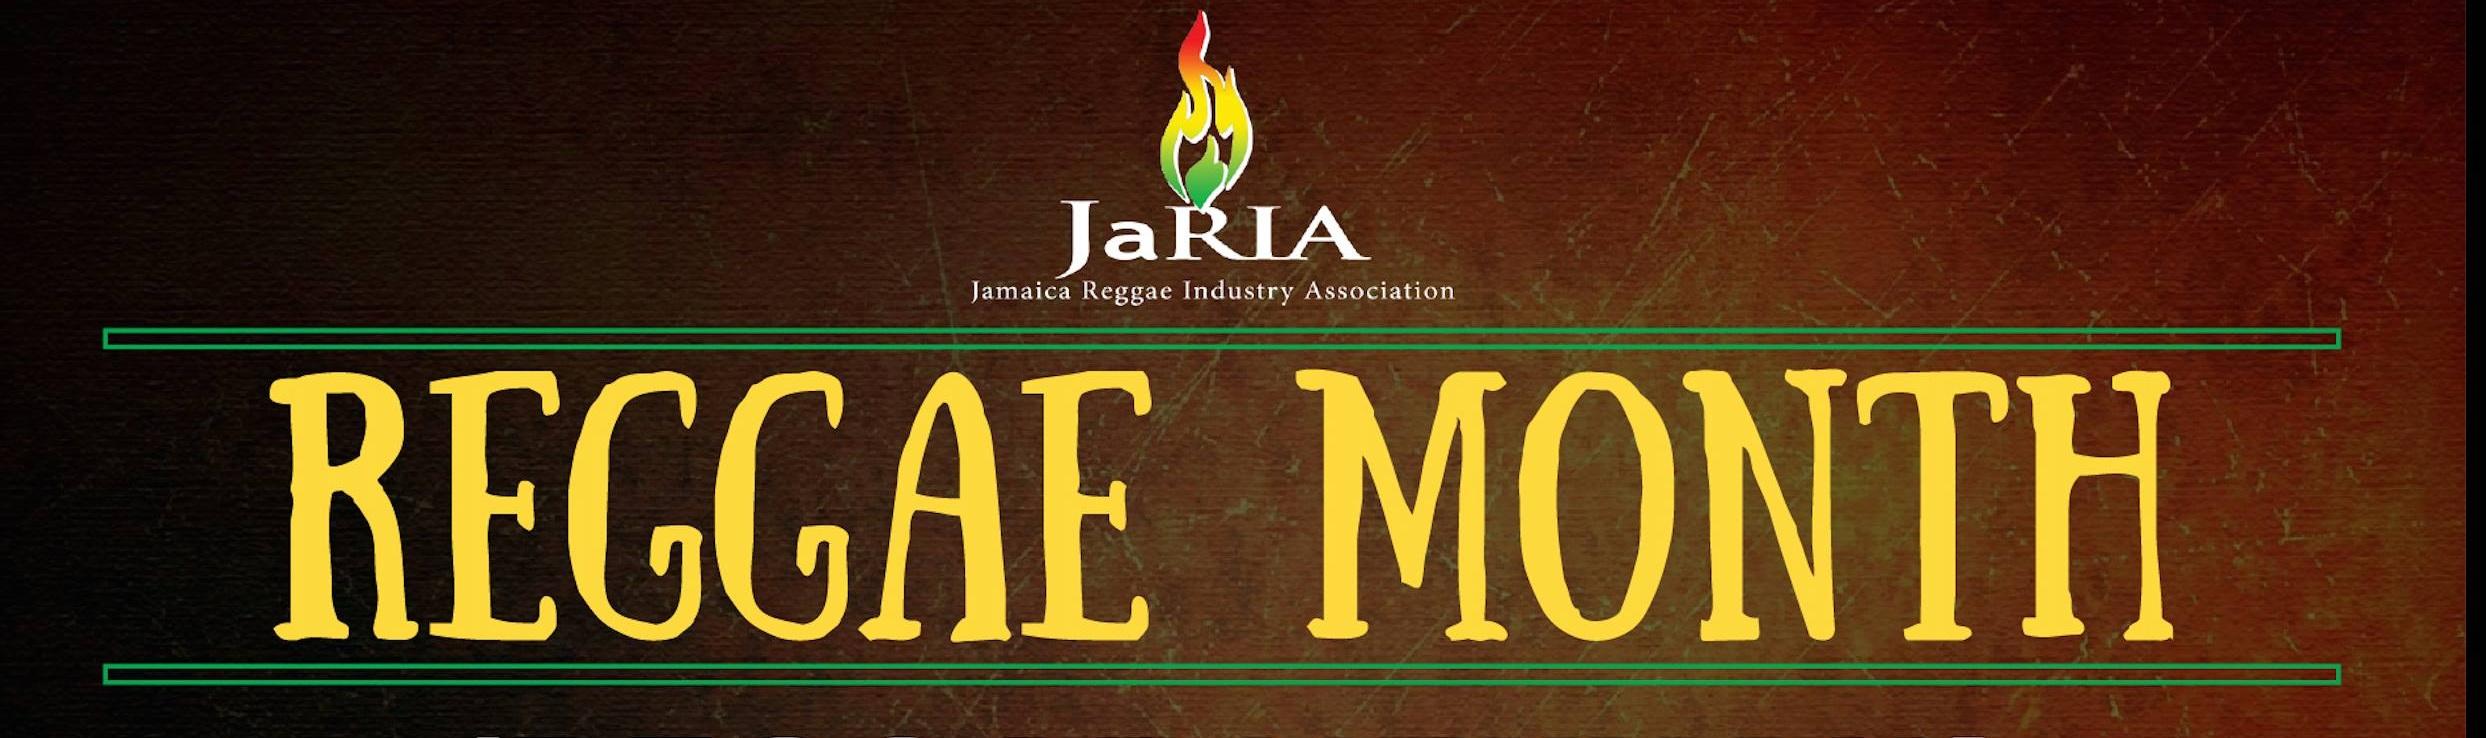 reggae+month.jpg